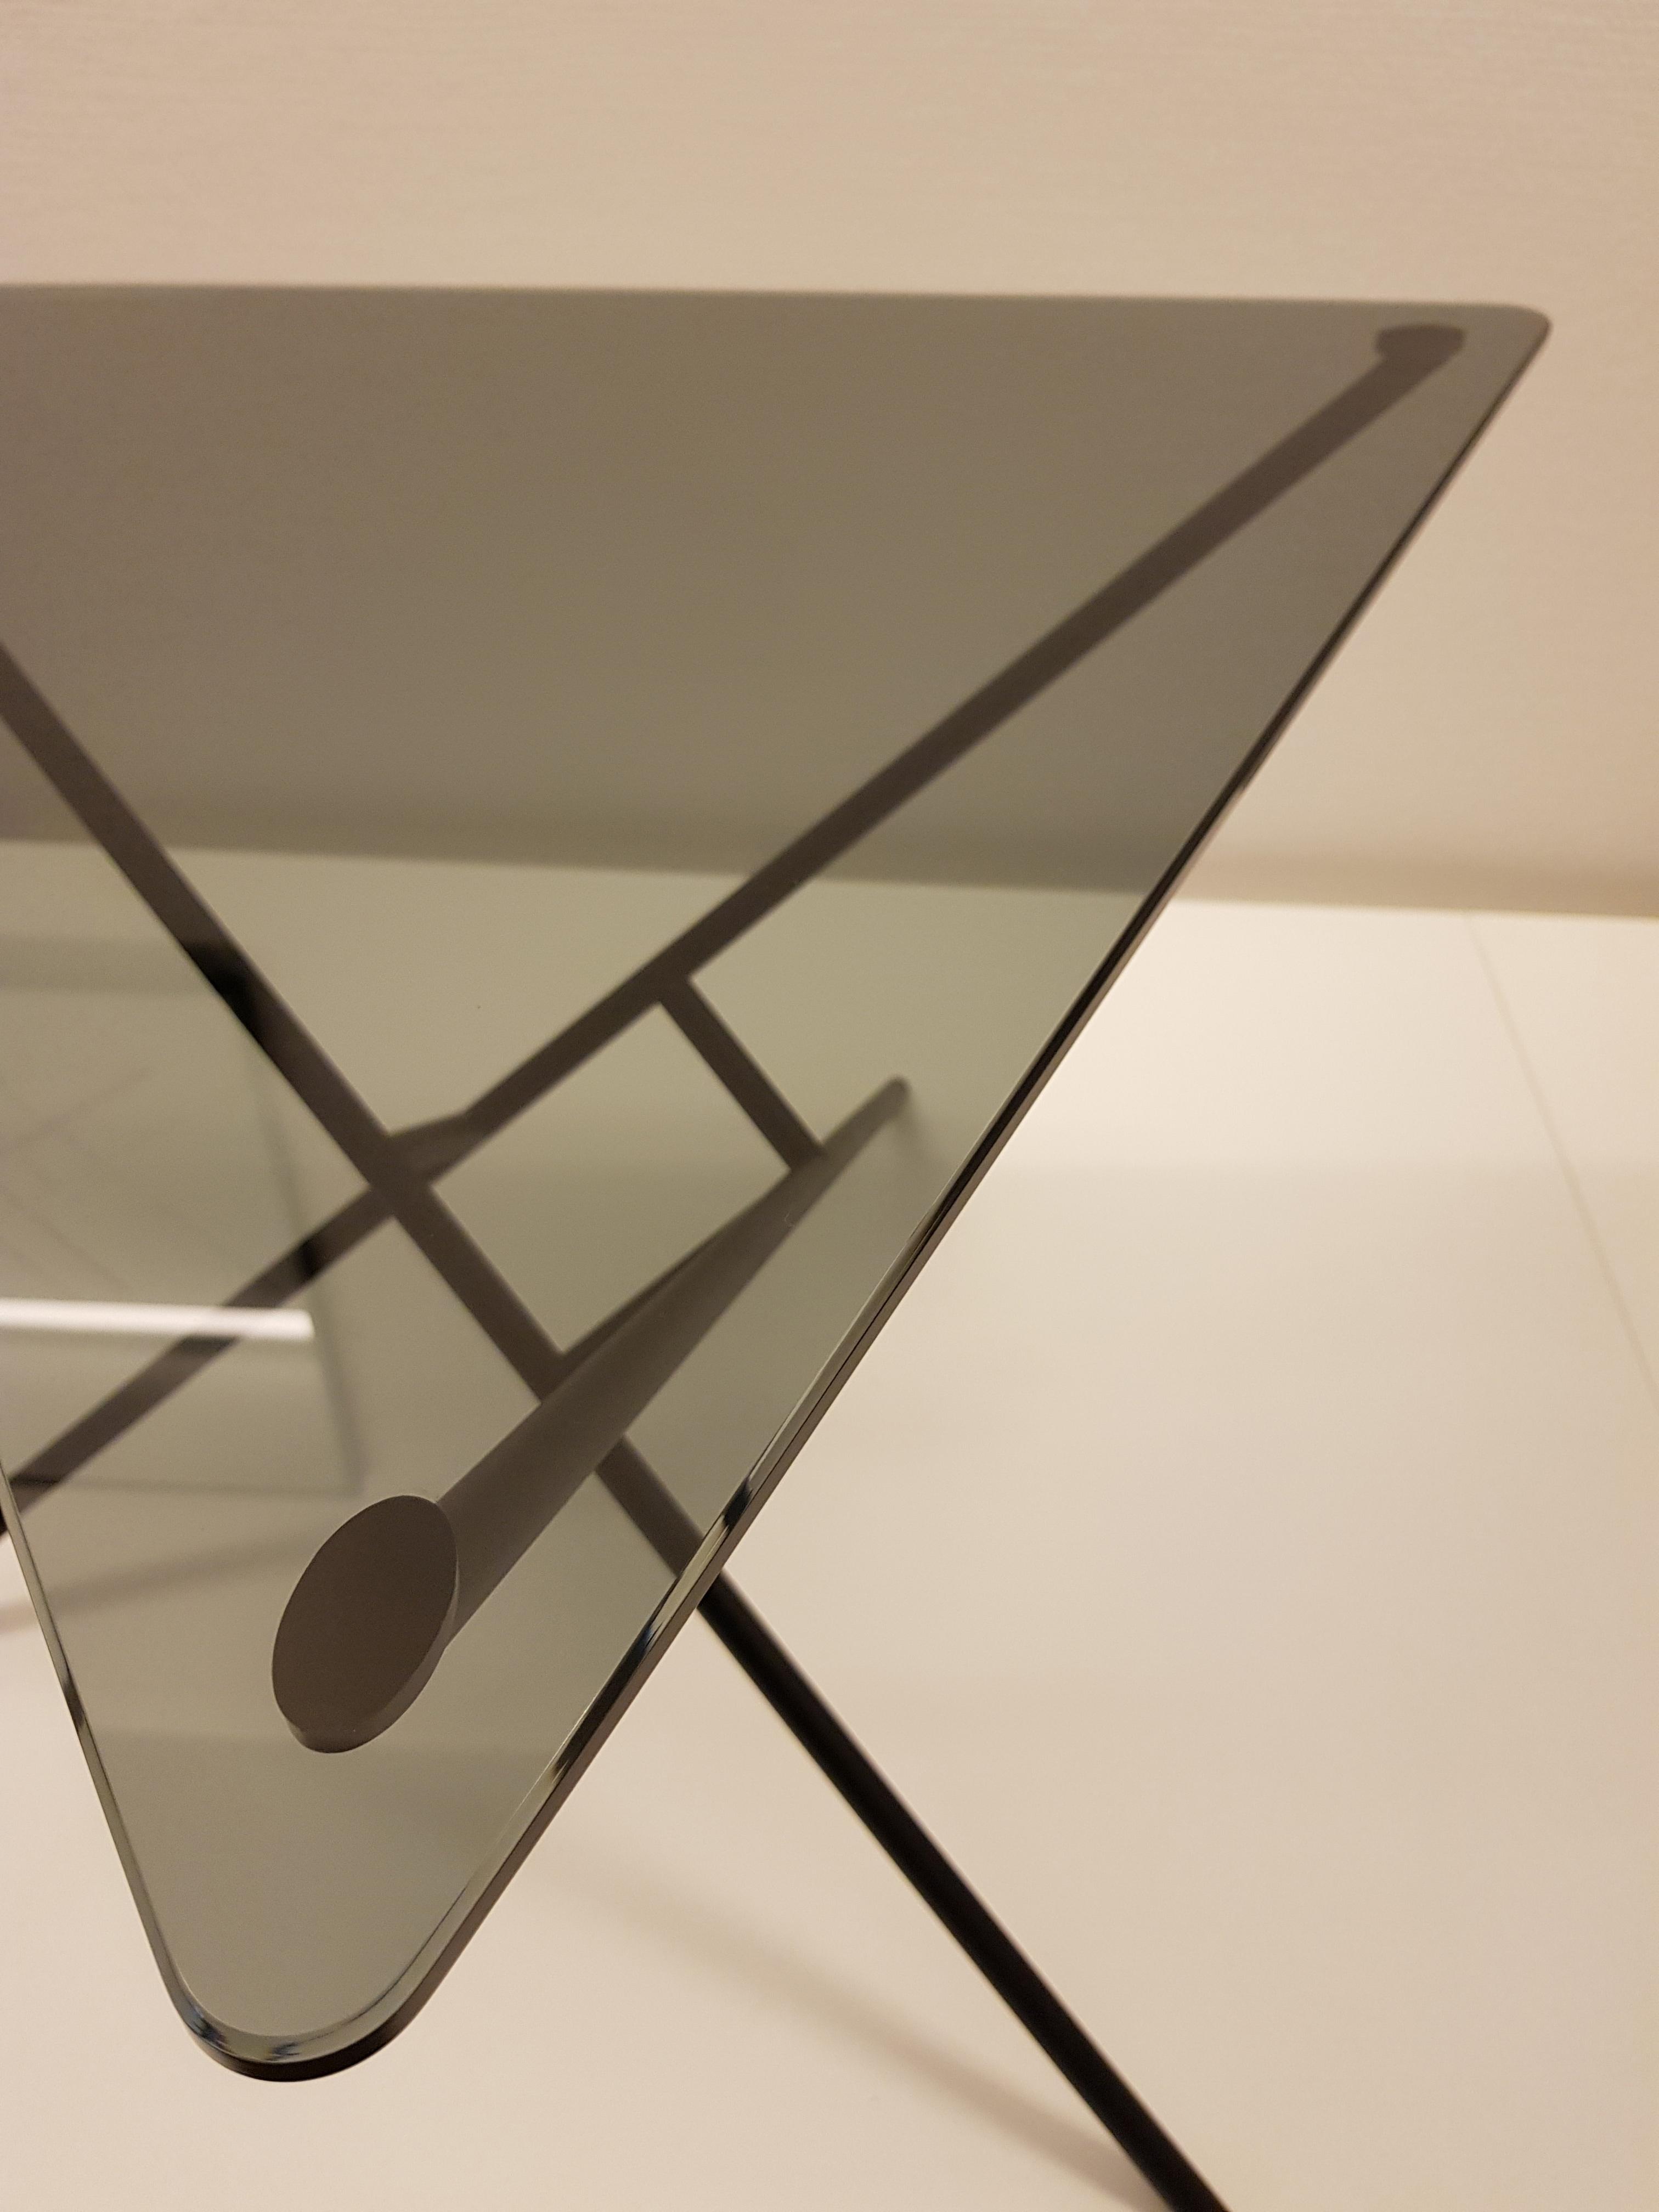 Projekte Dreieckige Platte Nahaufnahme